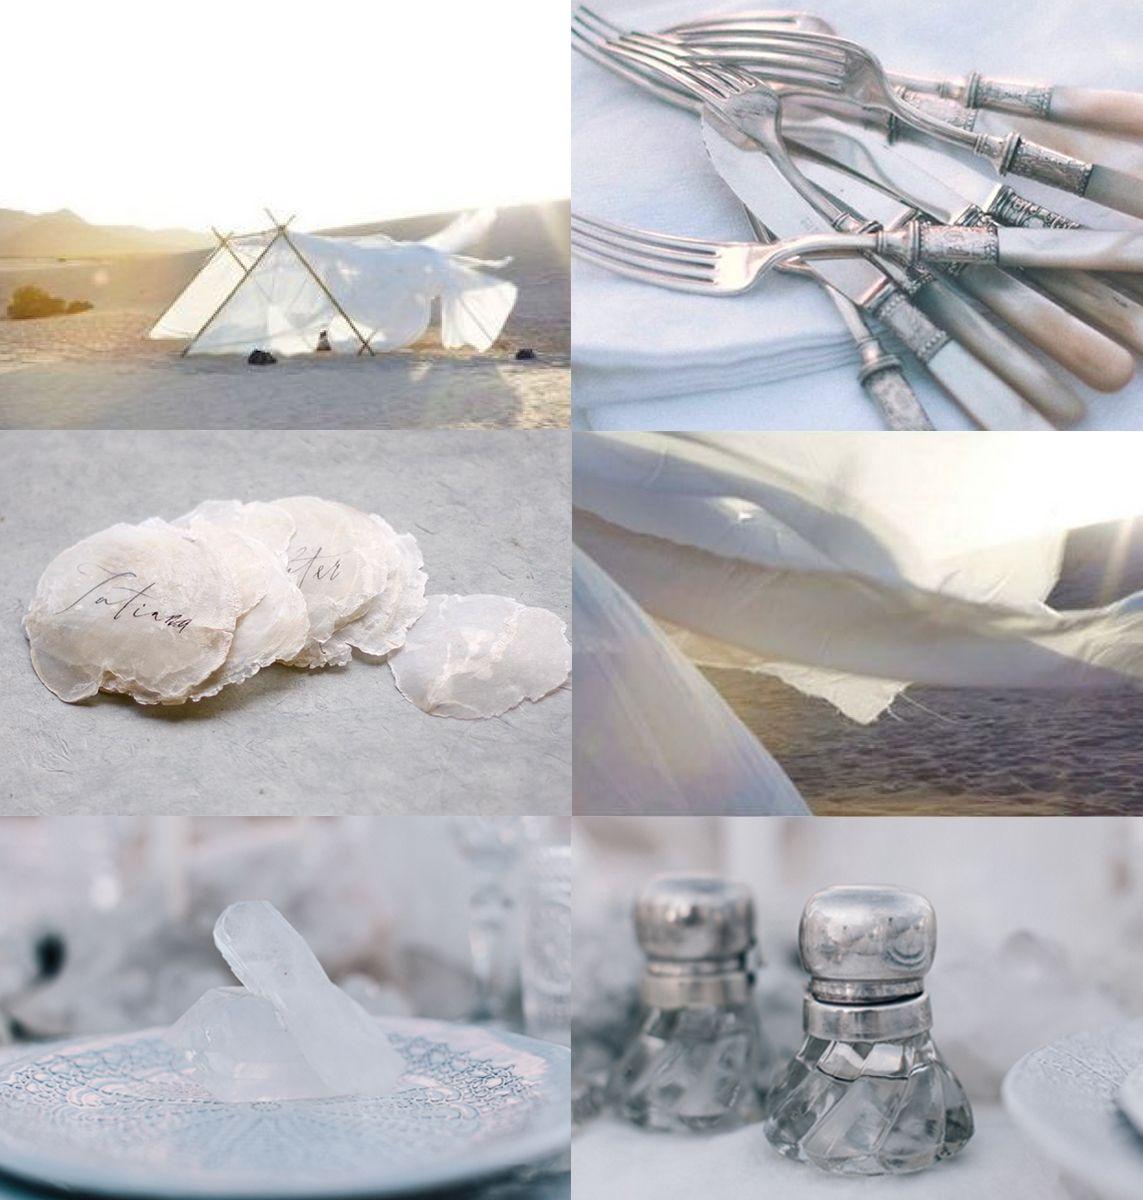 All White Picnic Wedding Reception Styling | BEACH I-DO | Pinterest ...